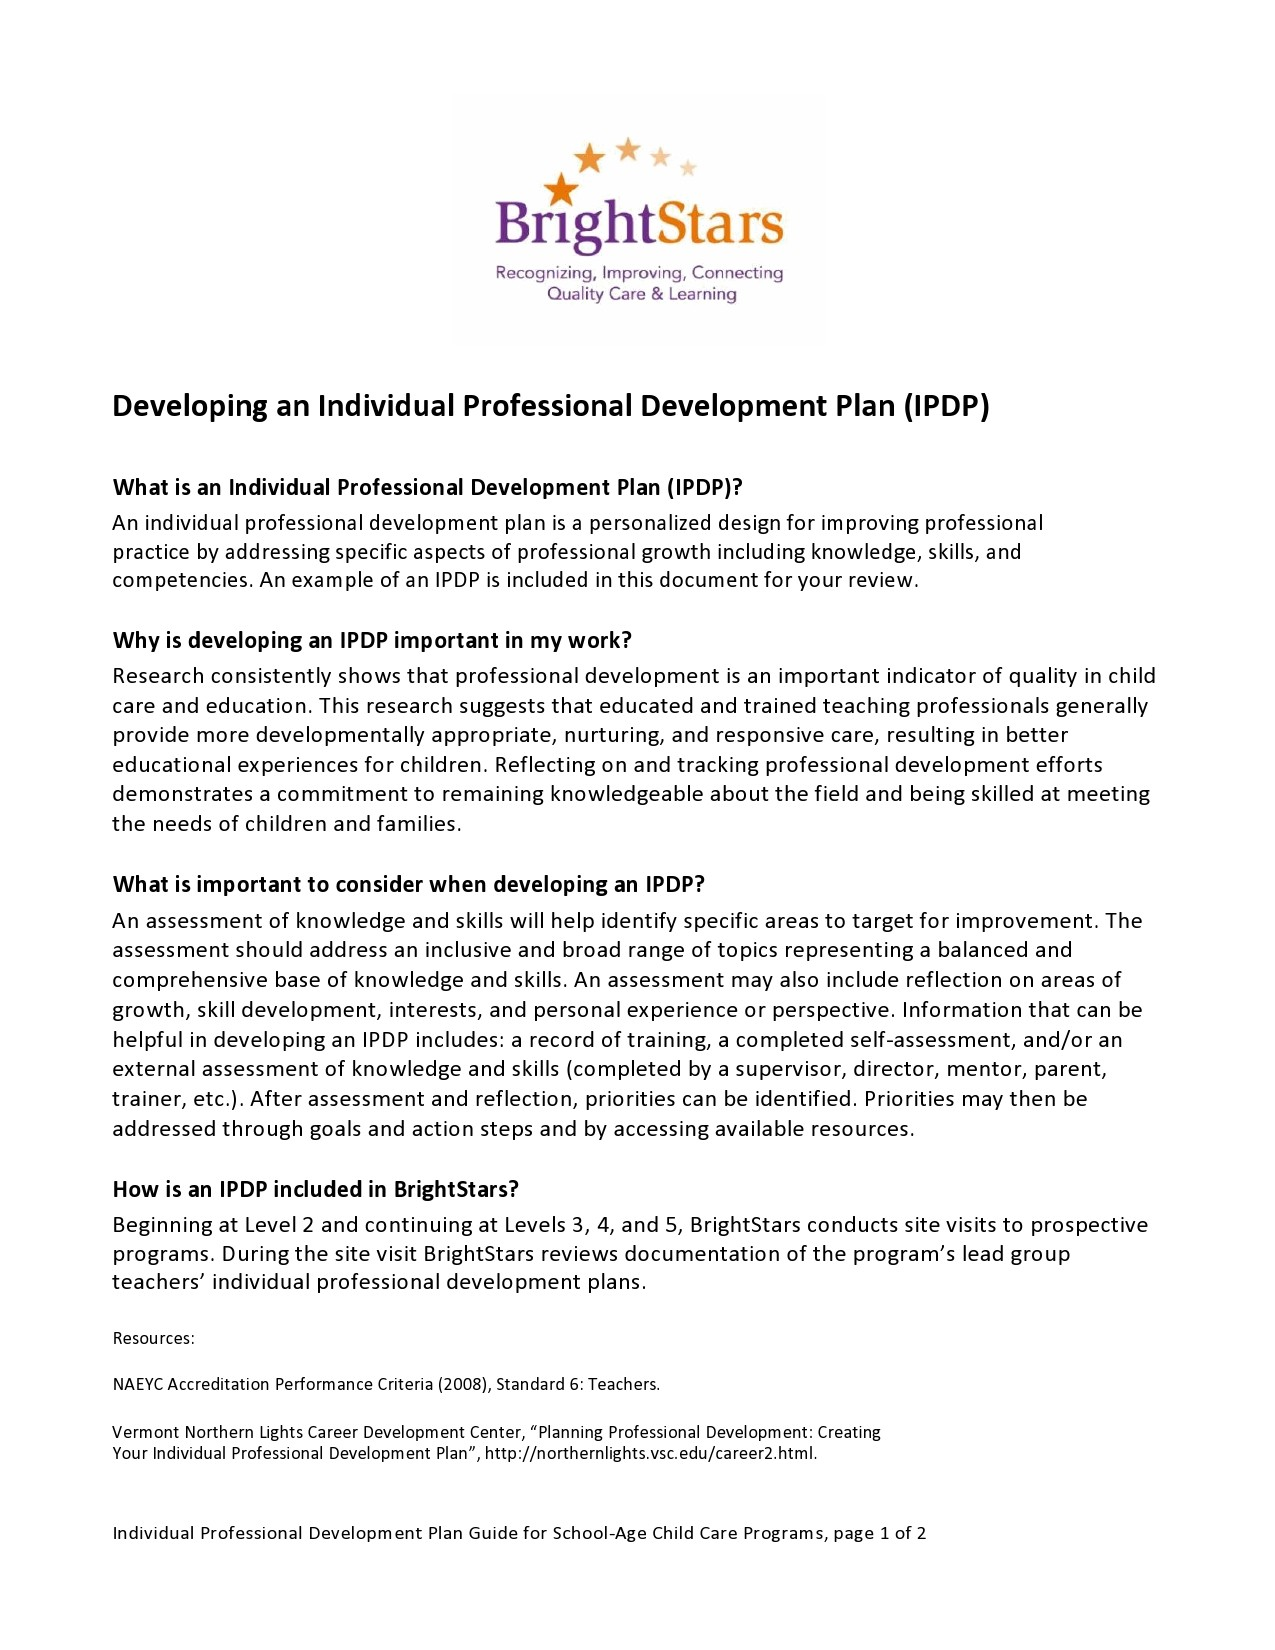 Free professional development plan 23